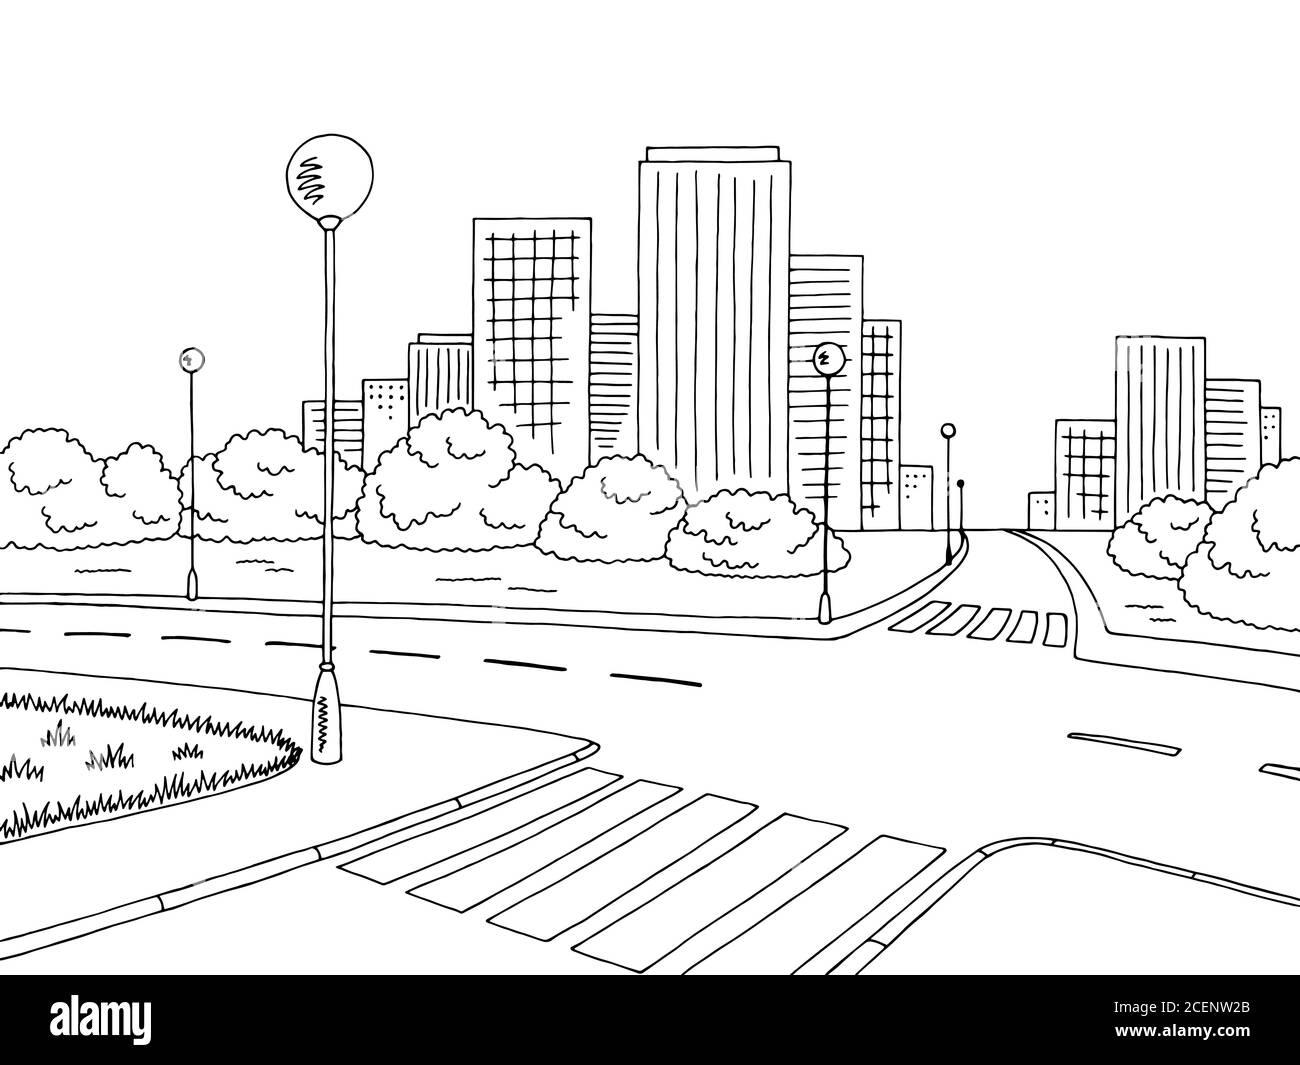 Street Road Graphic Black White City Landscape Sketch Illustration Vector Stock Vector Image Art Alamy